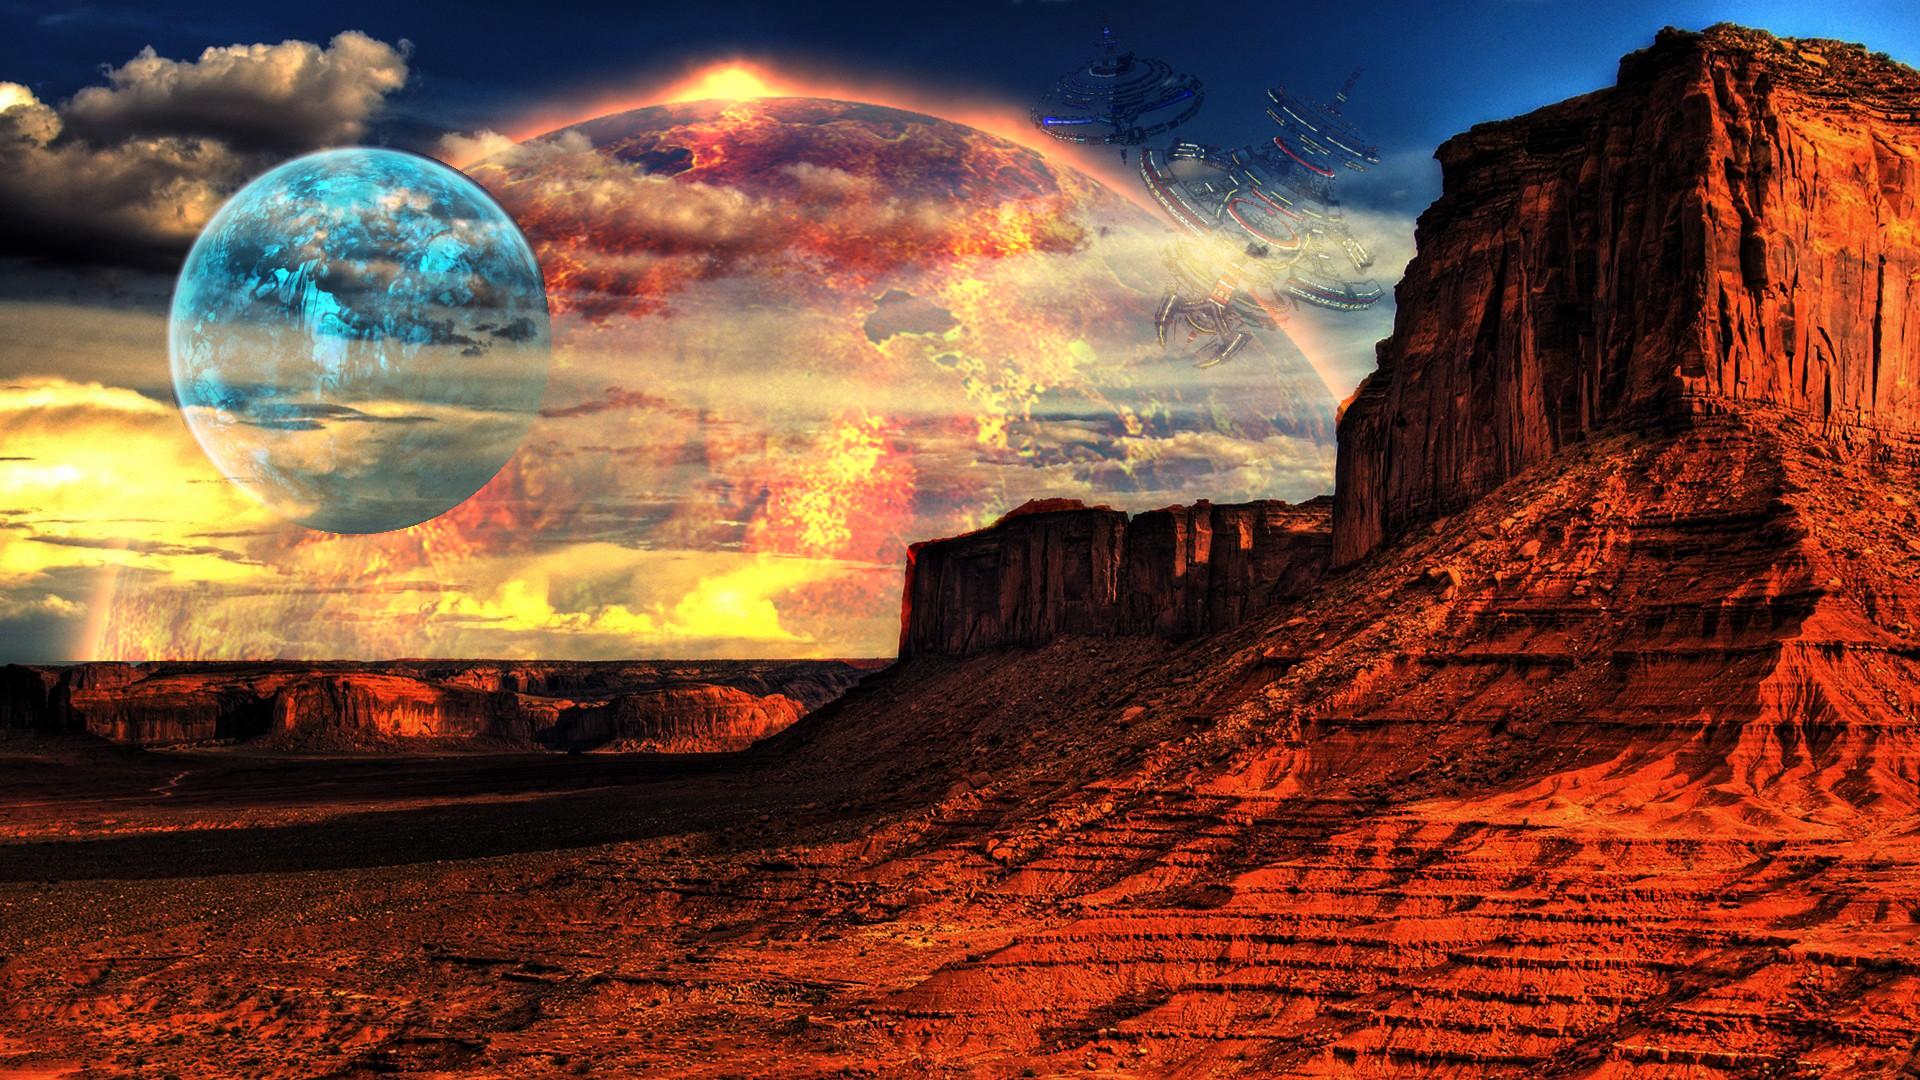 … Alien Landscape (16:9 version) by Soldgineer